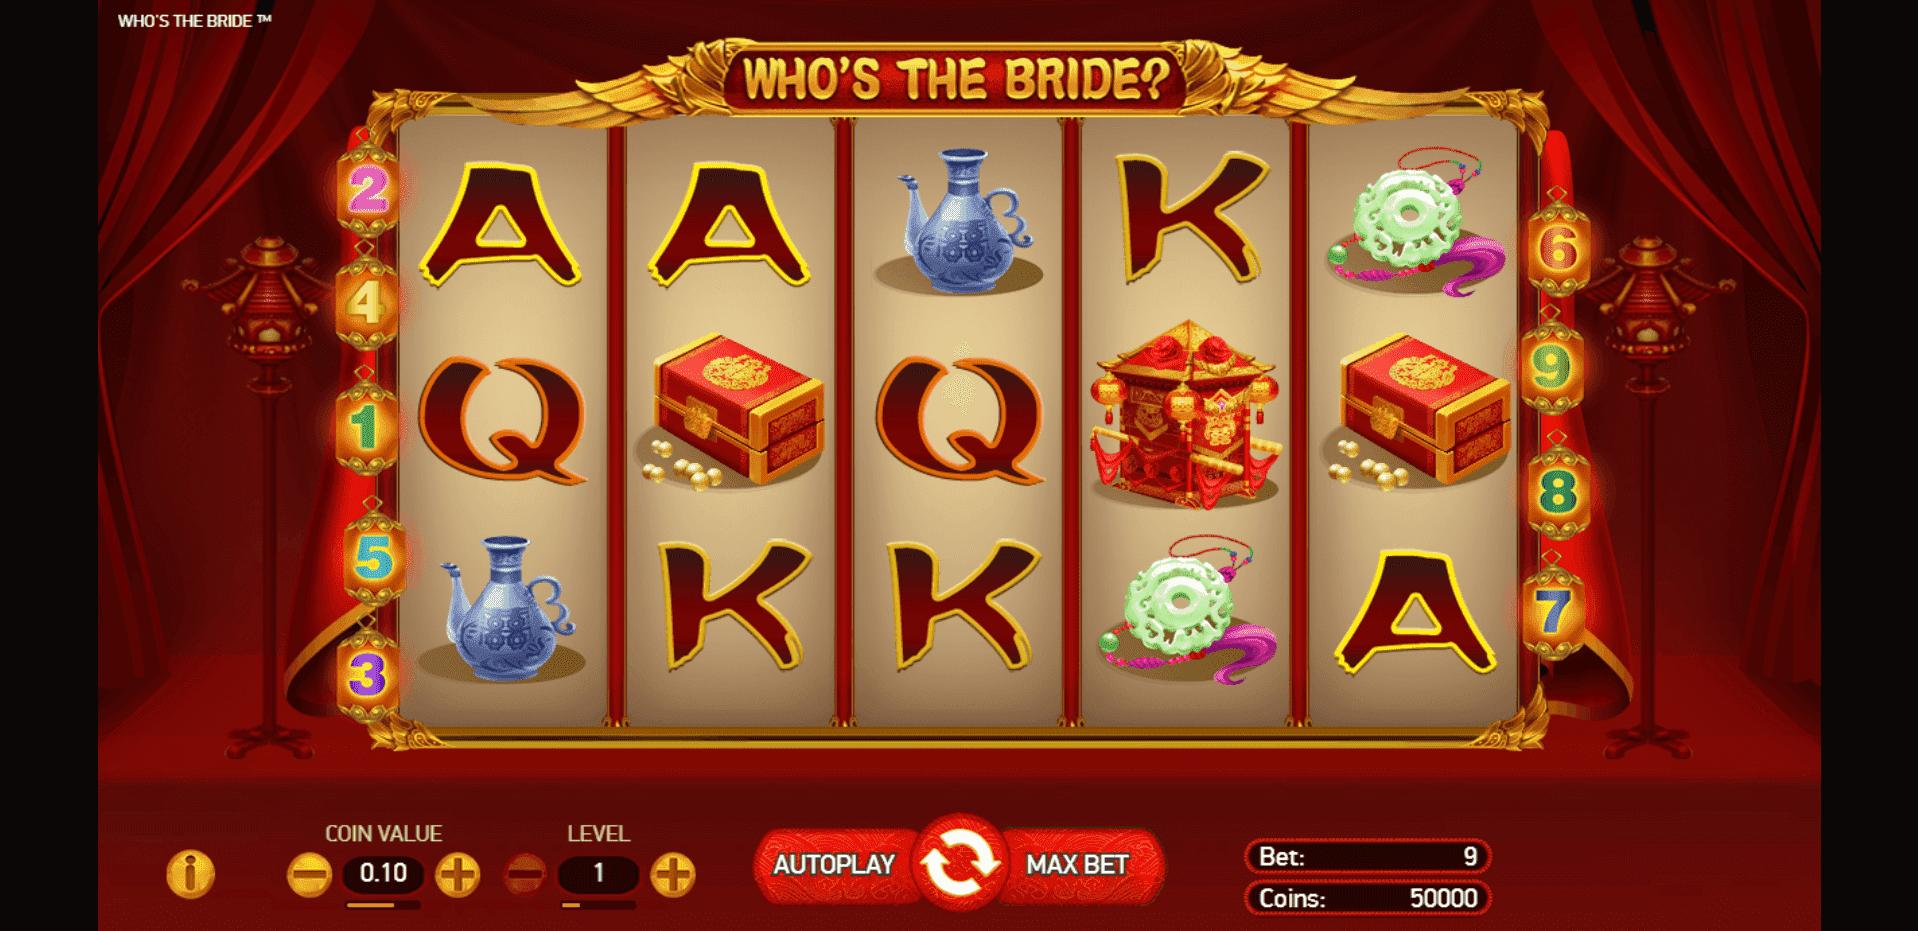 Whos the Bride slot machine screenshot